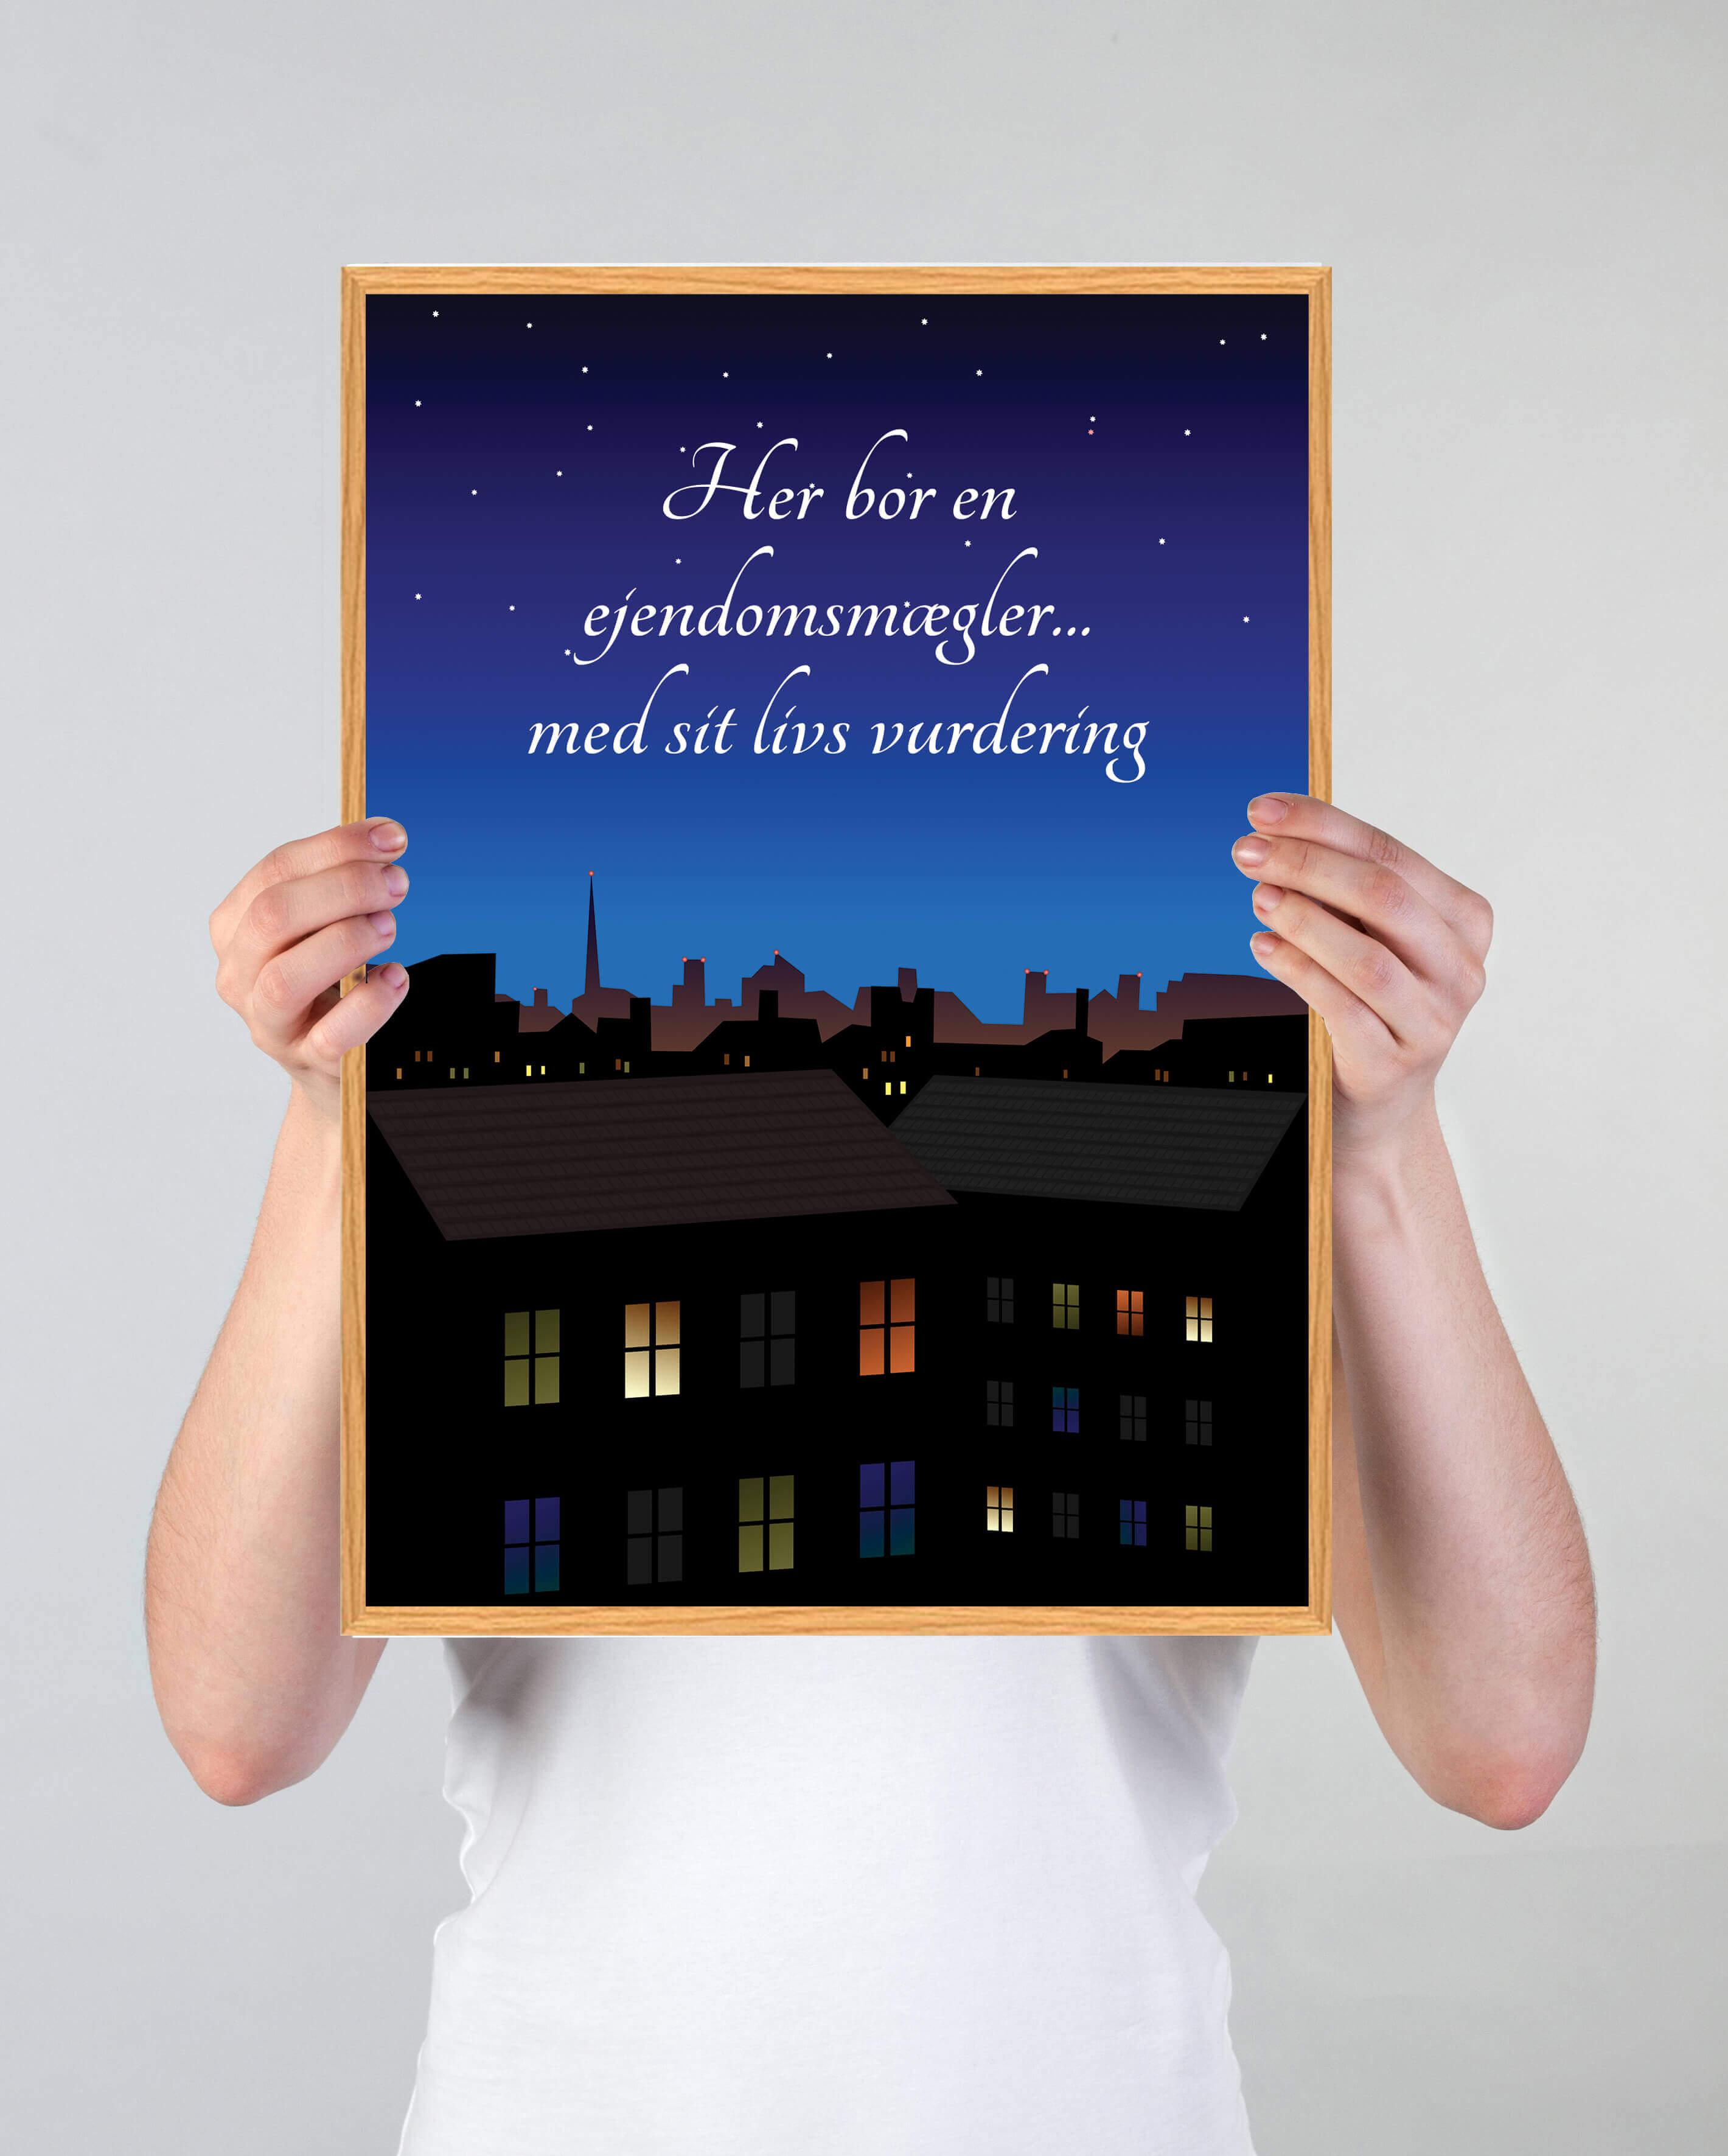 ejendomsmaegler-nat-plakat-3